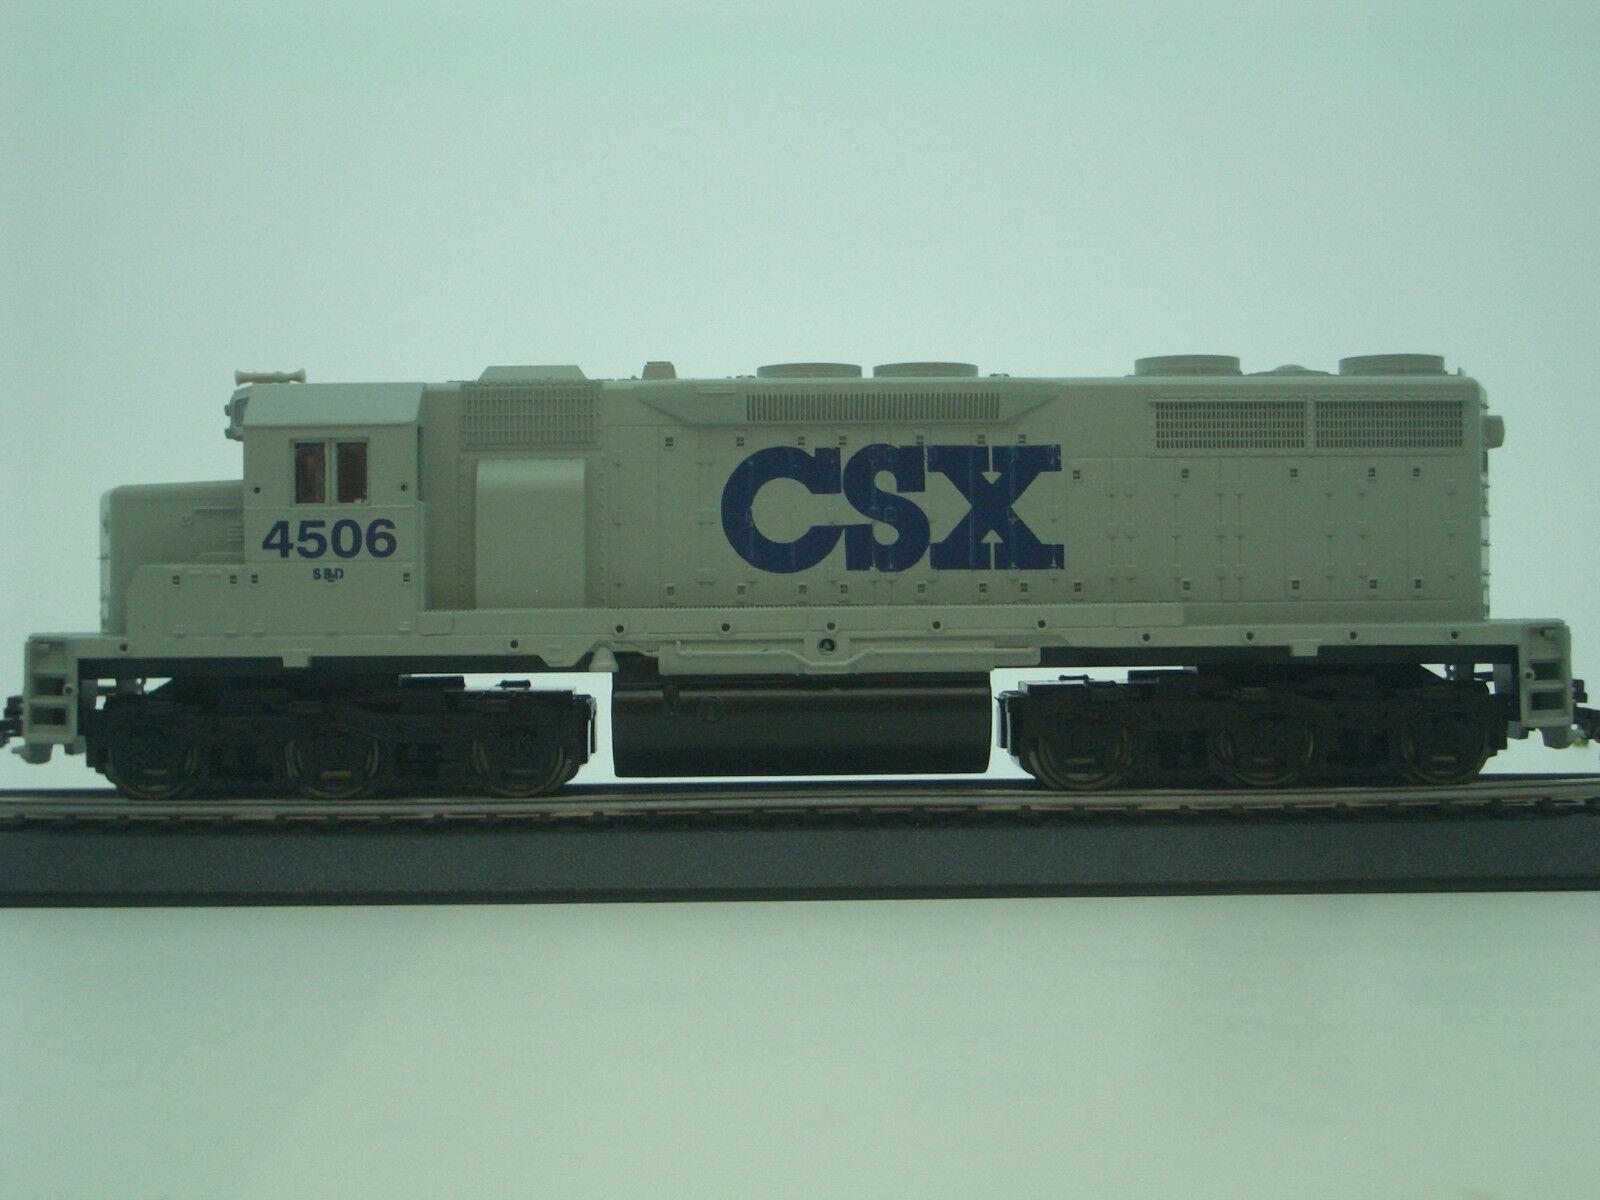 HO MEHANO DIESEL LOCO SD 35  CSX  DC ROAD   4506 CSX LOCOMOTIVE TRAIN  M705